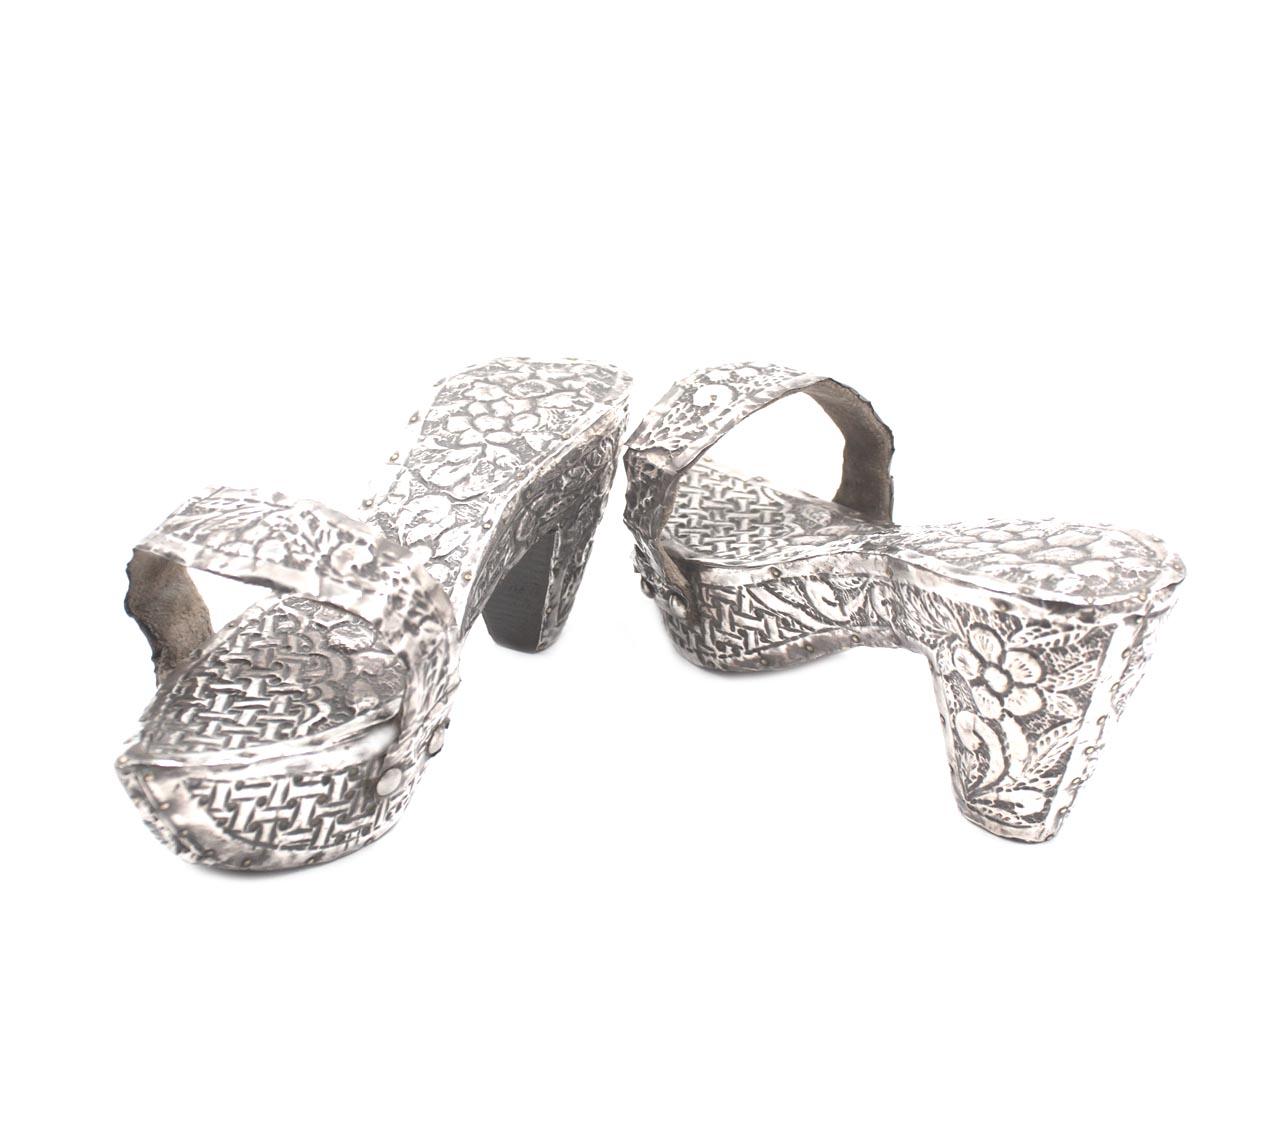 Vintage Silver floral Repousse Shoes Lacquered Wooden